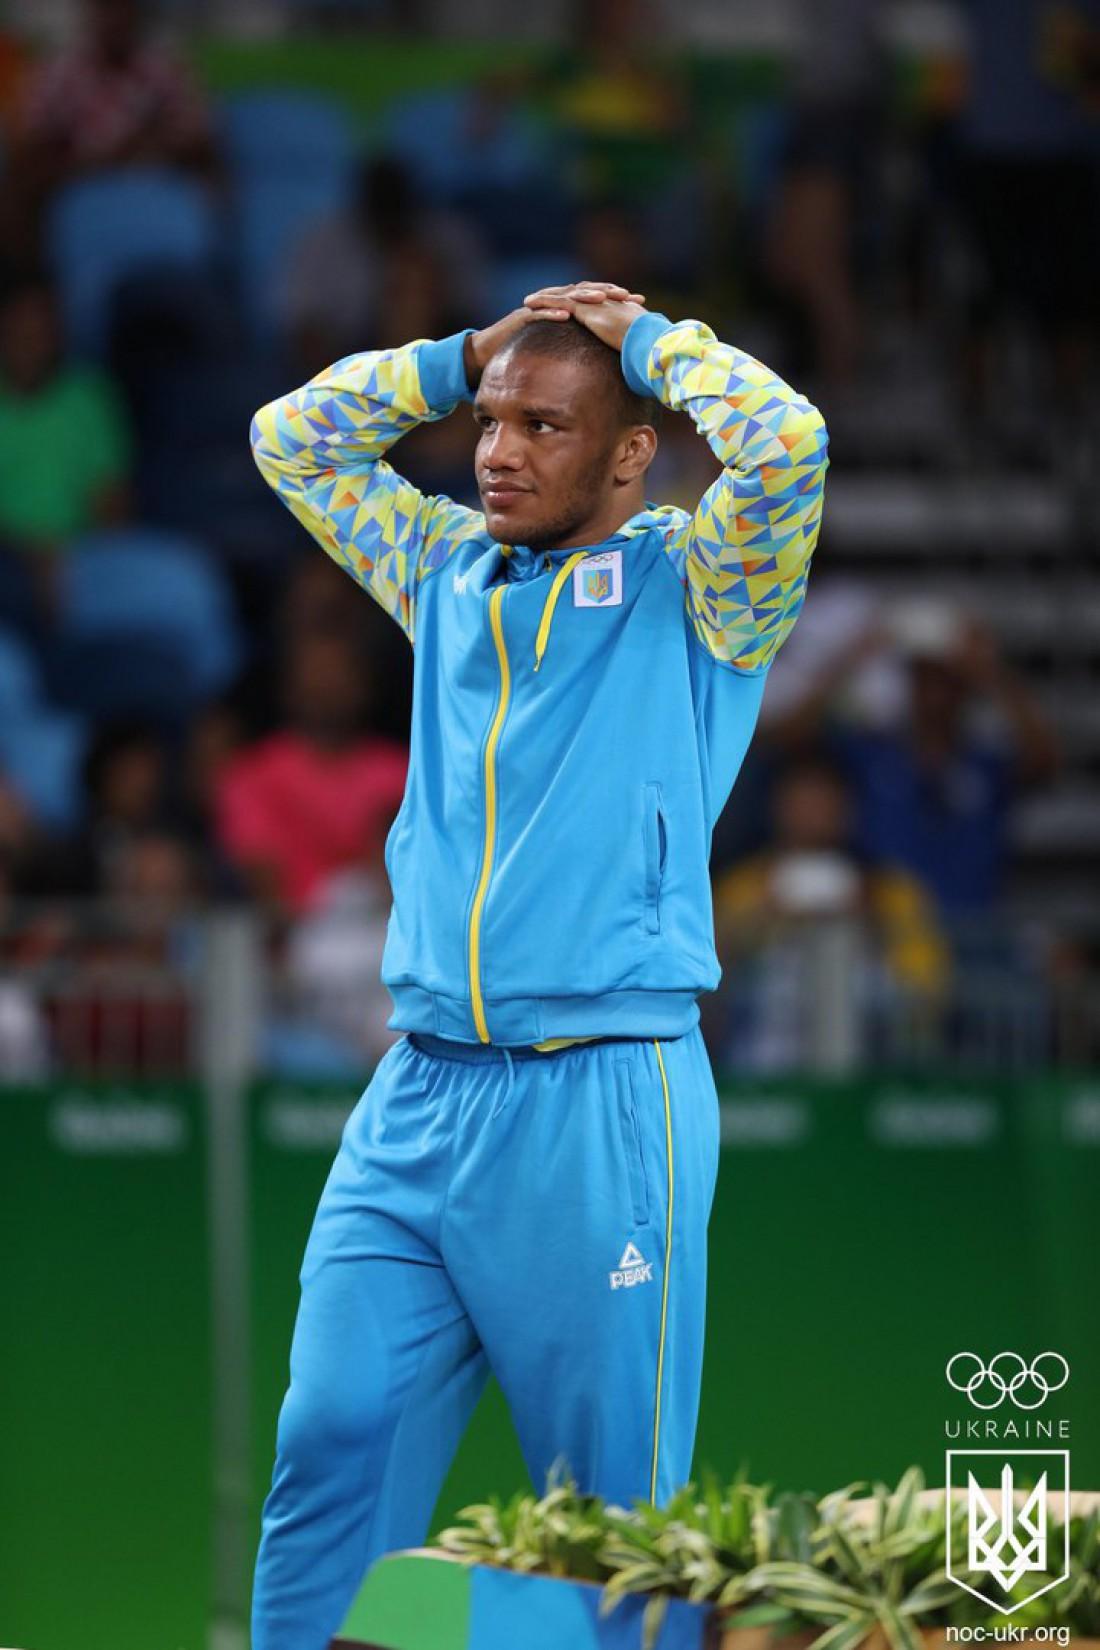 Жан Беленюк после финала Олимпиады